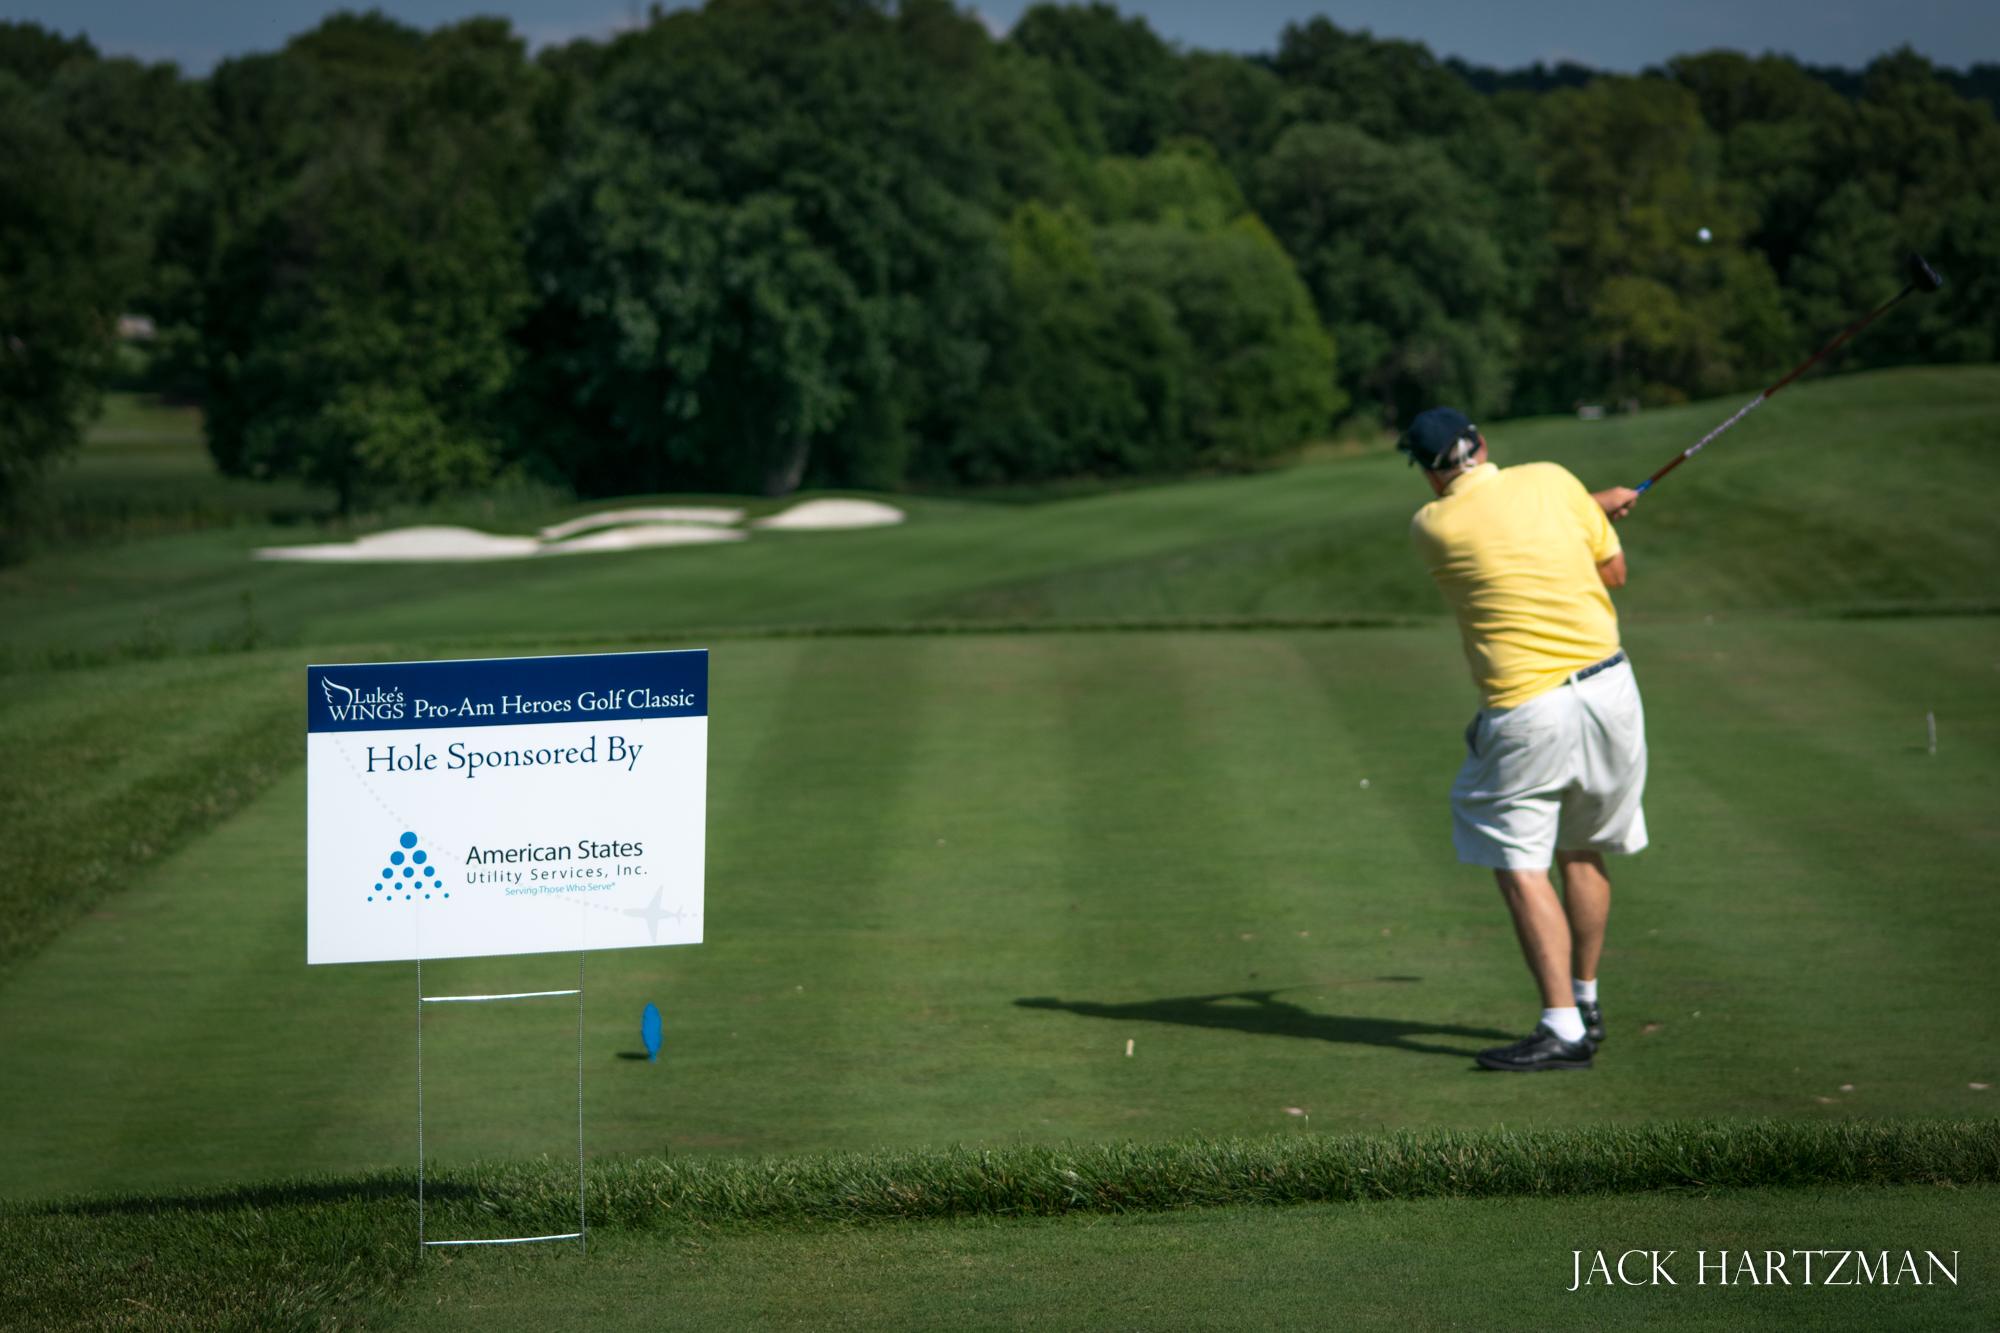 ASUS is proud to be a corporate sponsor of Luke's Wings